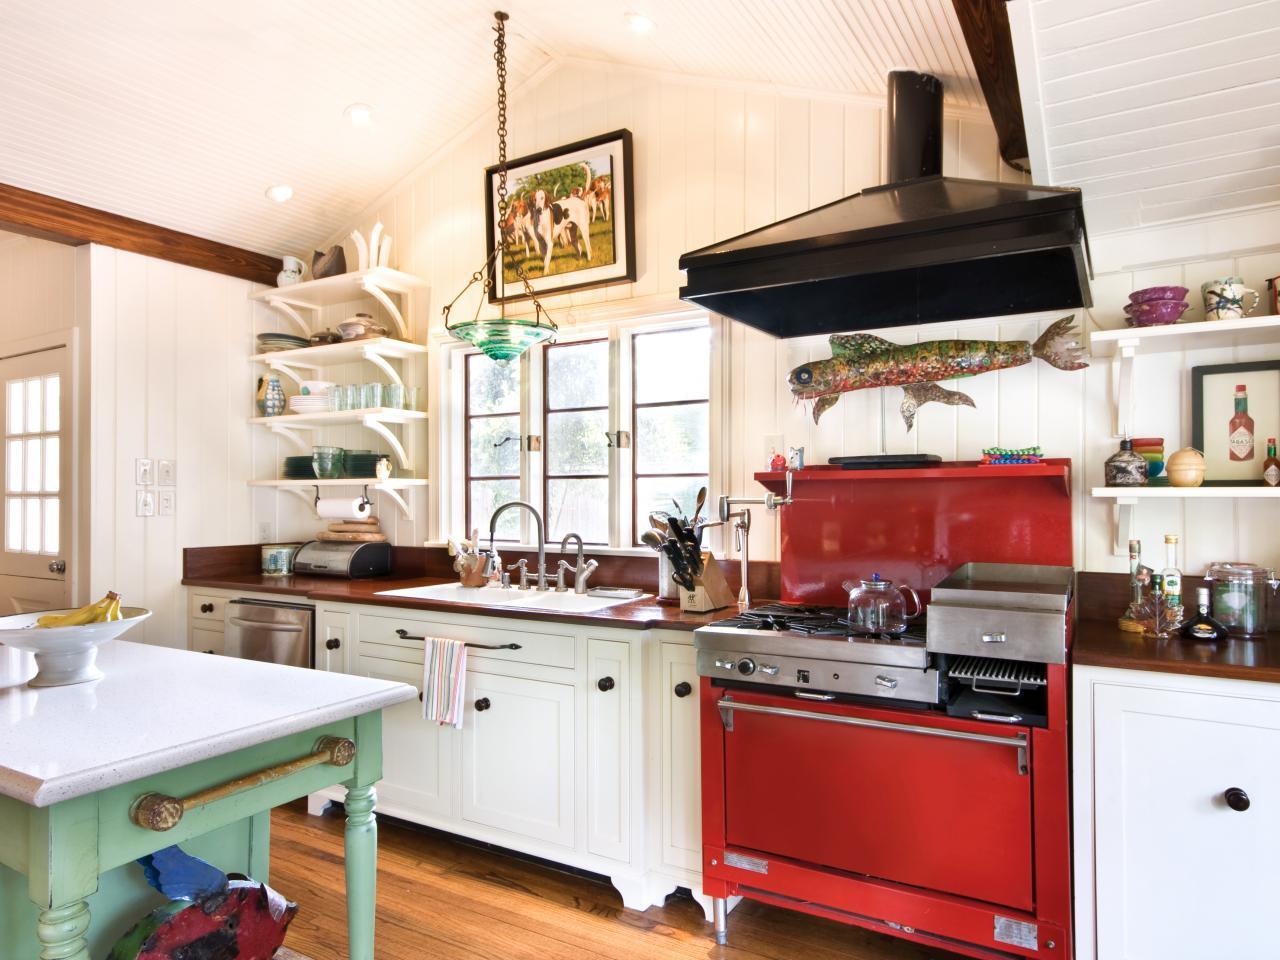 Astonishing Custom Cottage Kitchen Rodney Tassistro Hgtv Home Interior And Landscaping Ologienasavecom